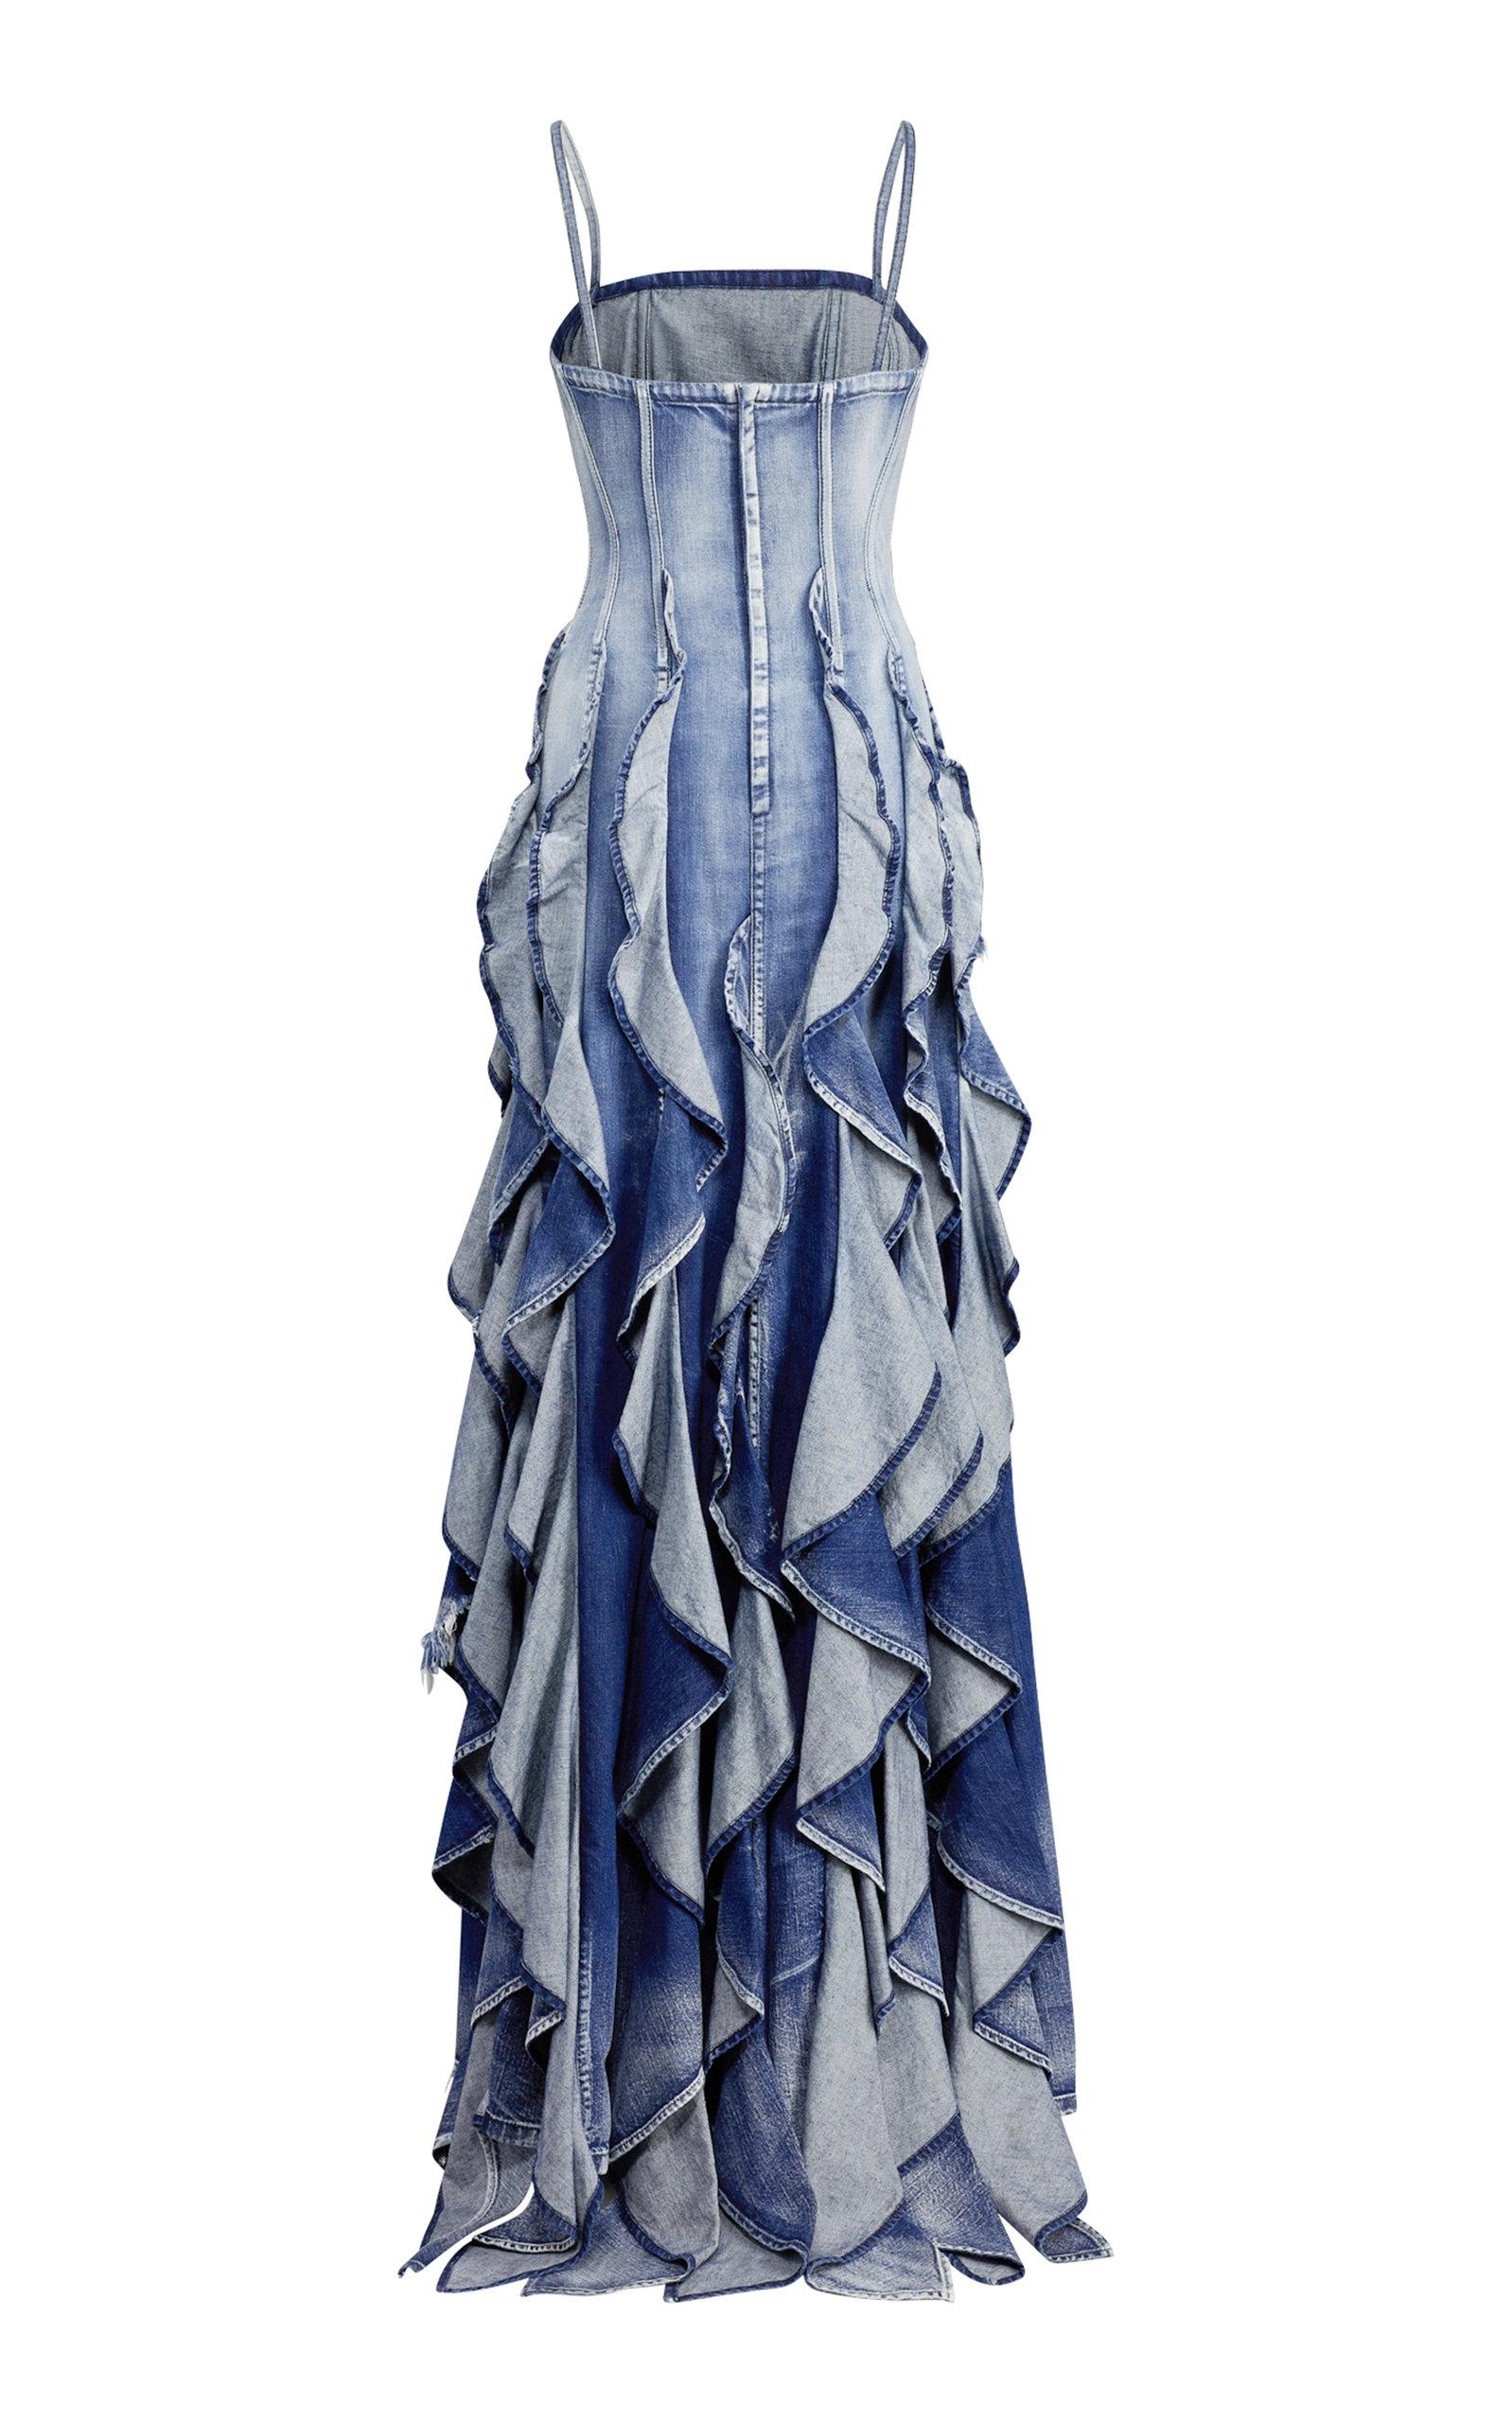 34a5929203 Ralph LaurenDenim Eve Evening Dress. CLOSE. Loading. Loading